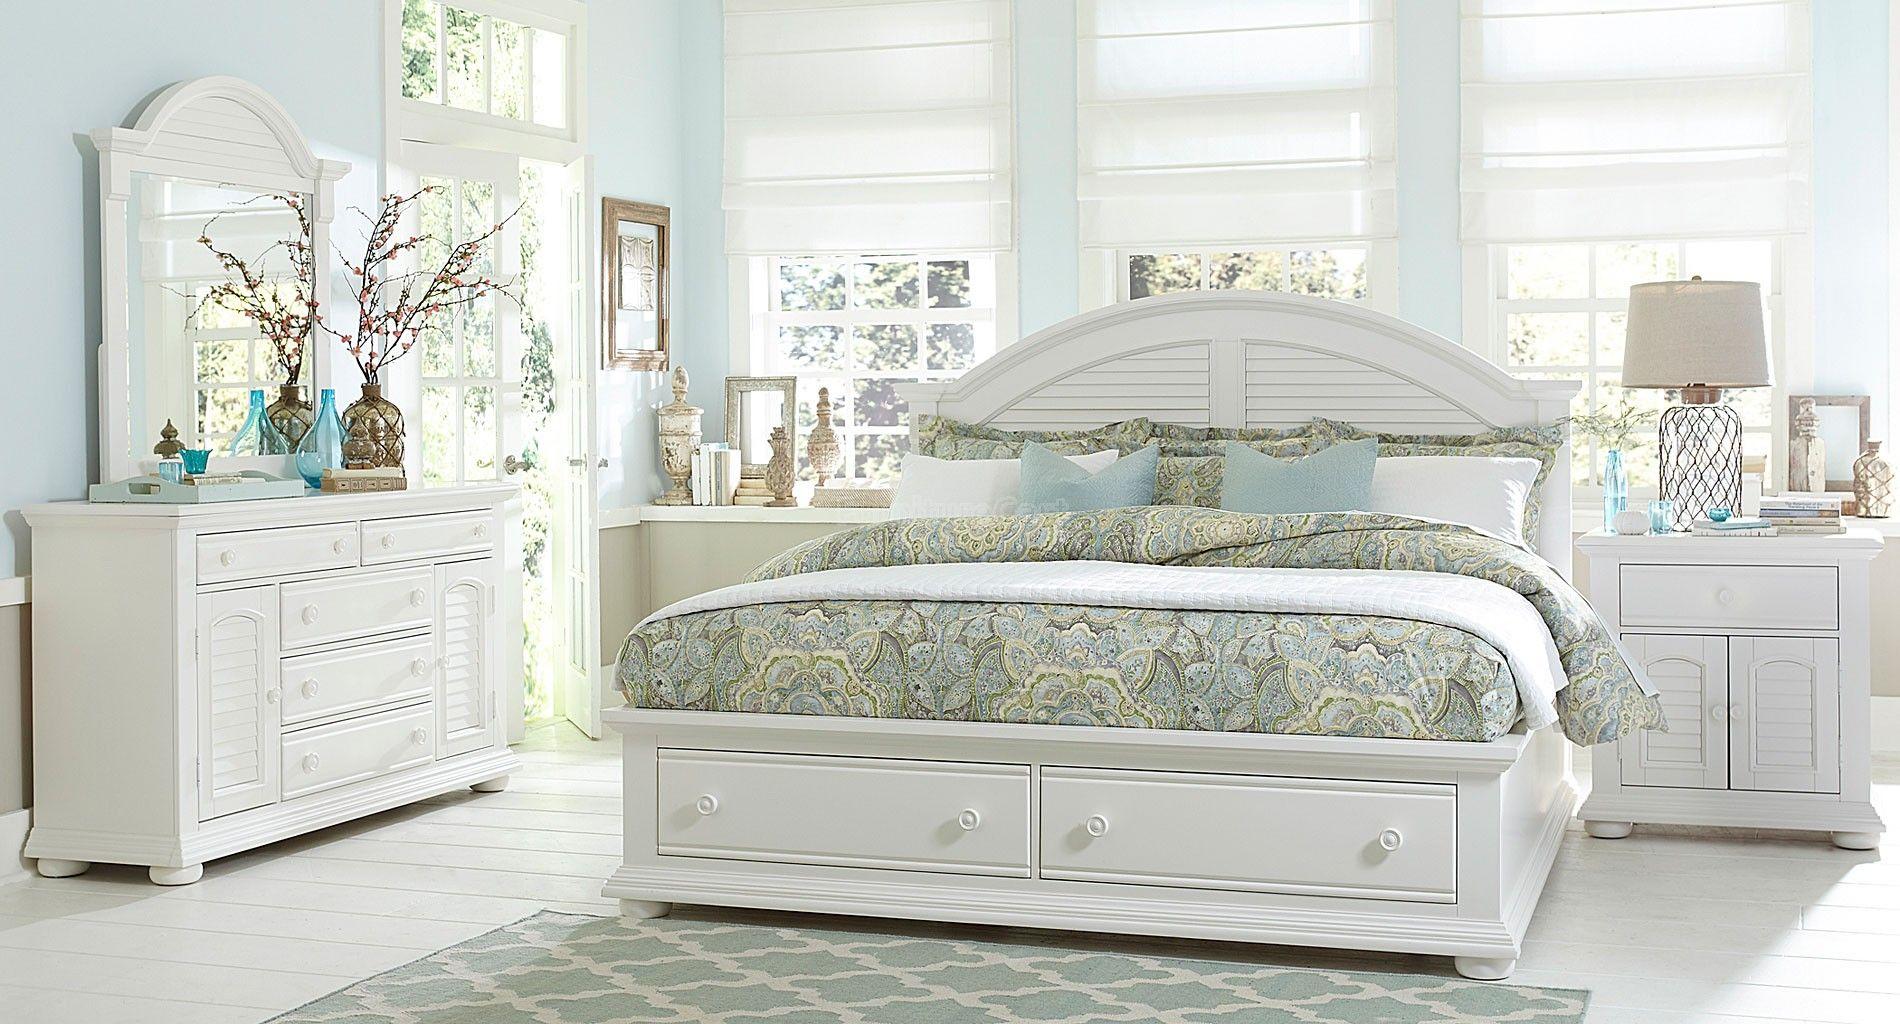 Summer House I Storage Bedroom Set Liberty furniture